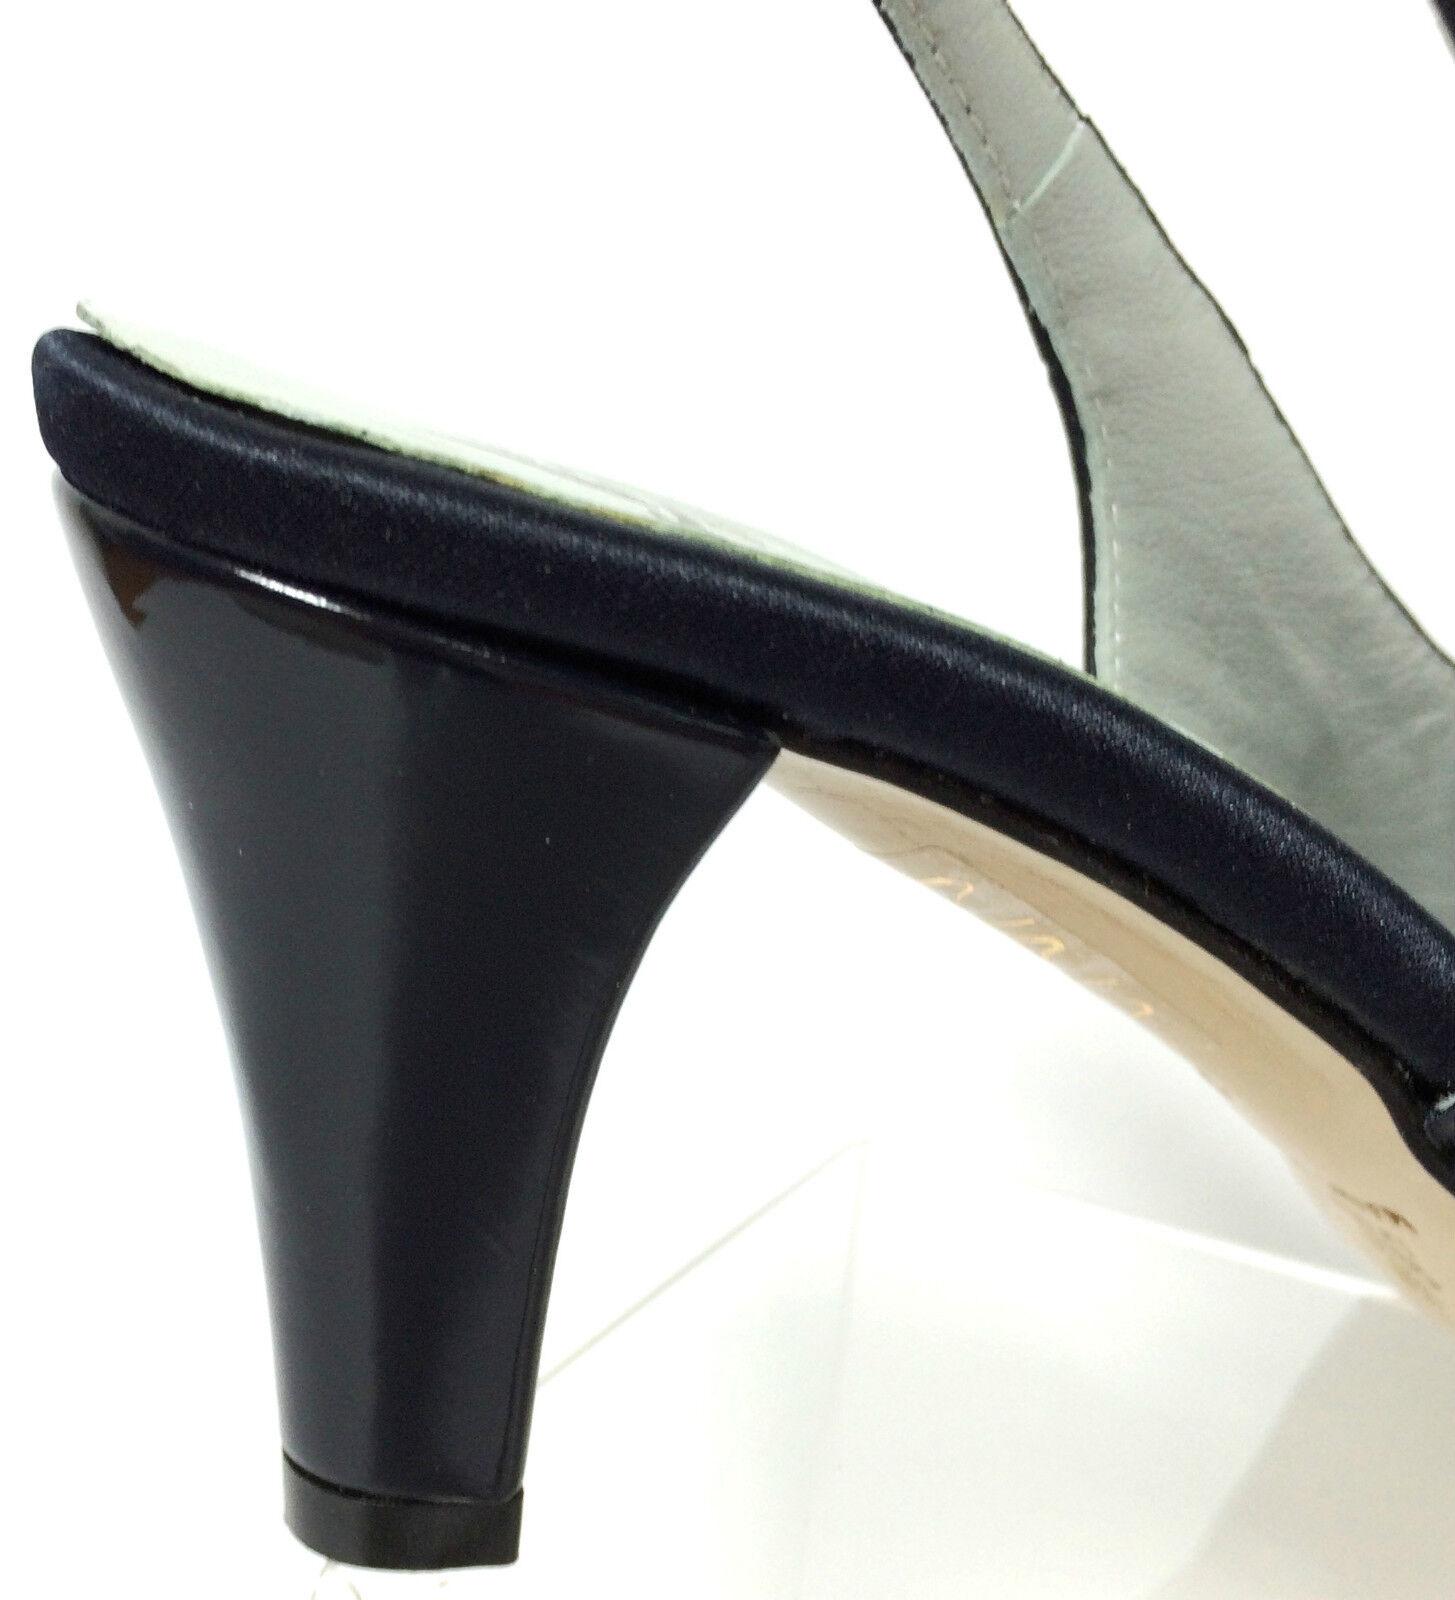 SOFFICE SOGNO SCARPE SCARPE SCARPE COMODE DONNA SANDALI RASO IN SETA ColoreeeE BLU TACCO H 7 CM | Un'apparenza Elegante  a2757b